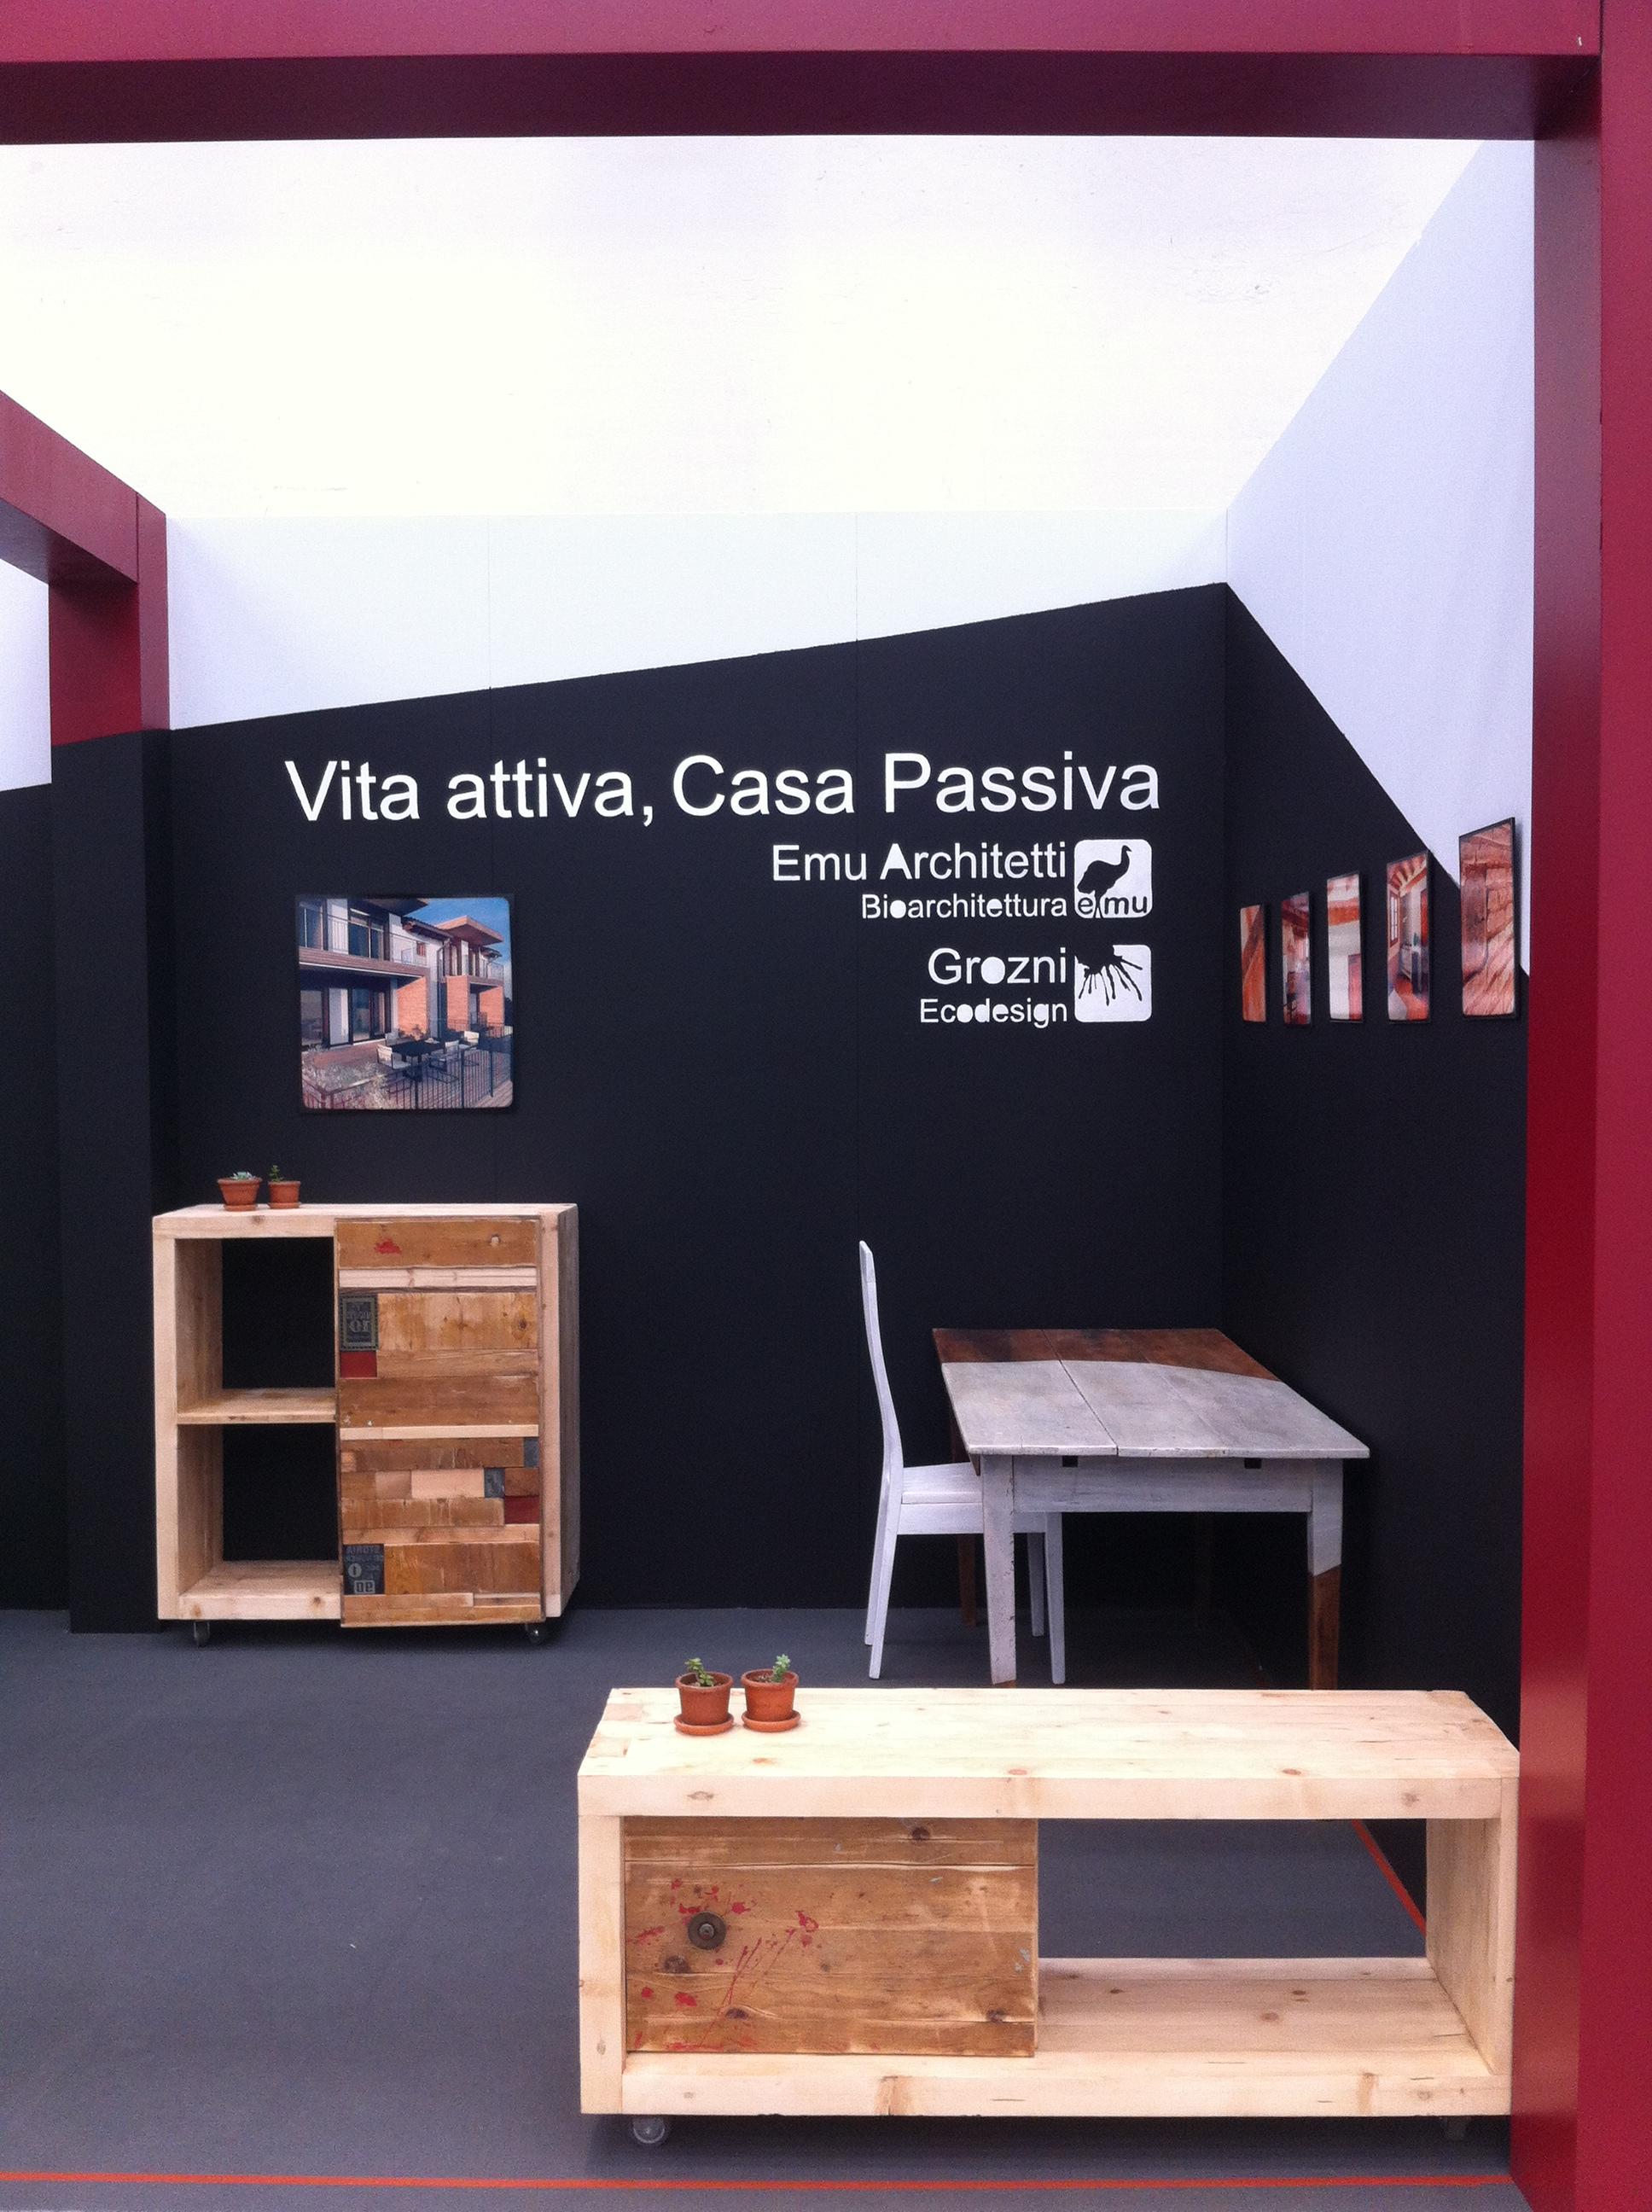 Emu Architects with furnishings by Grozni 5 - Casa&Tavola expo 2012 Reggio Emilia